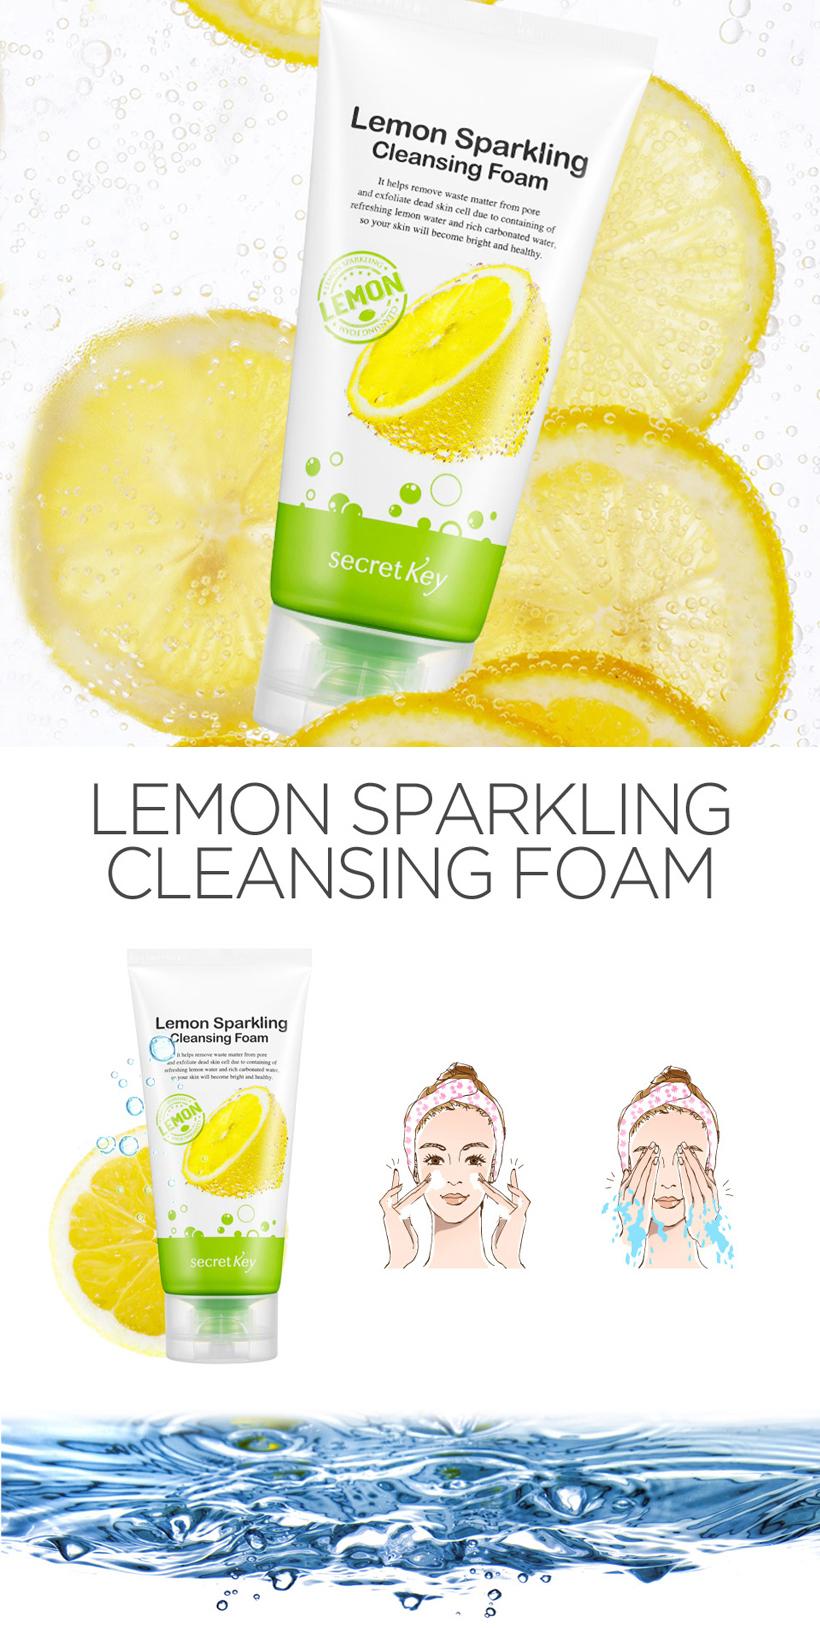 Znalezione obrazy dla zapytania secret key lemon sparkling cleansing foam